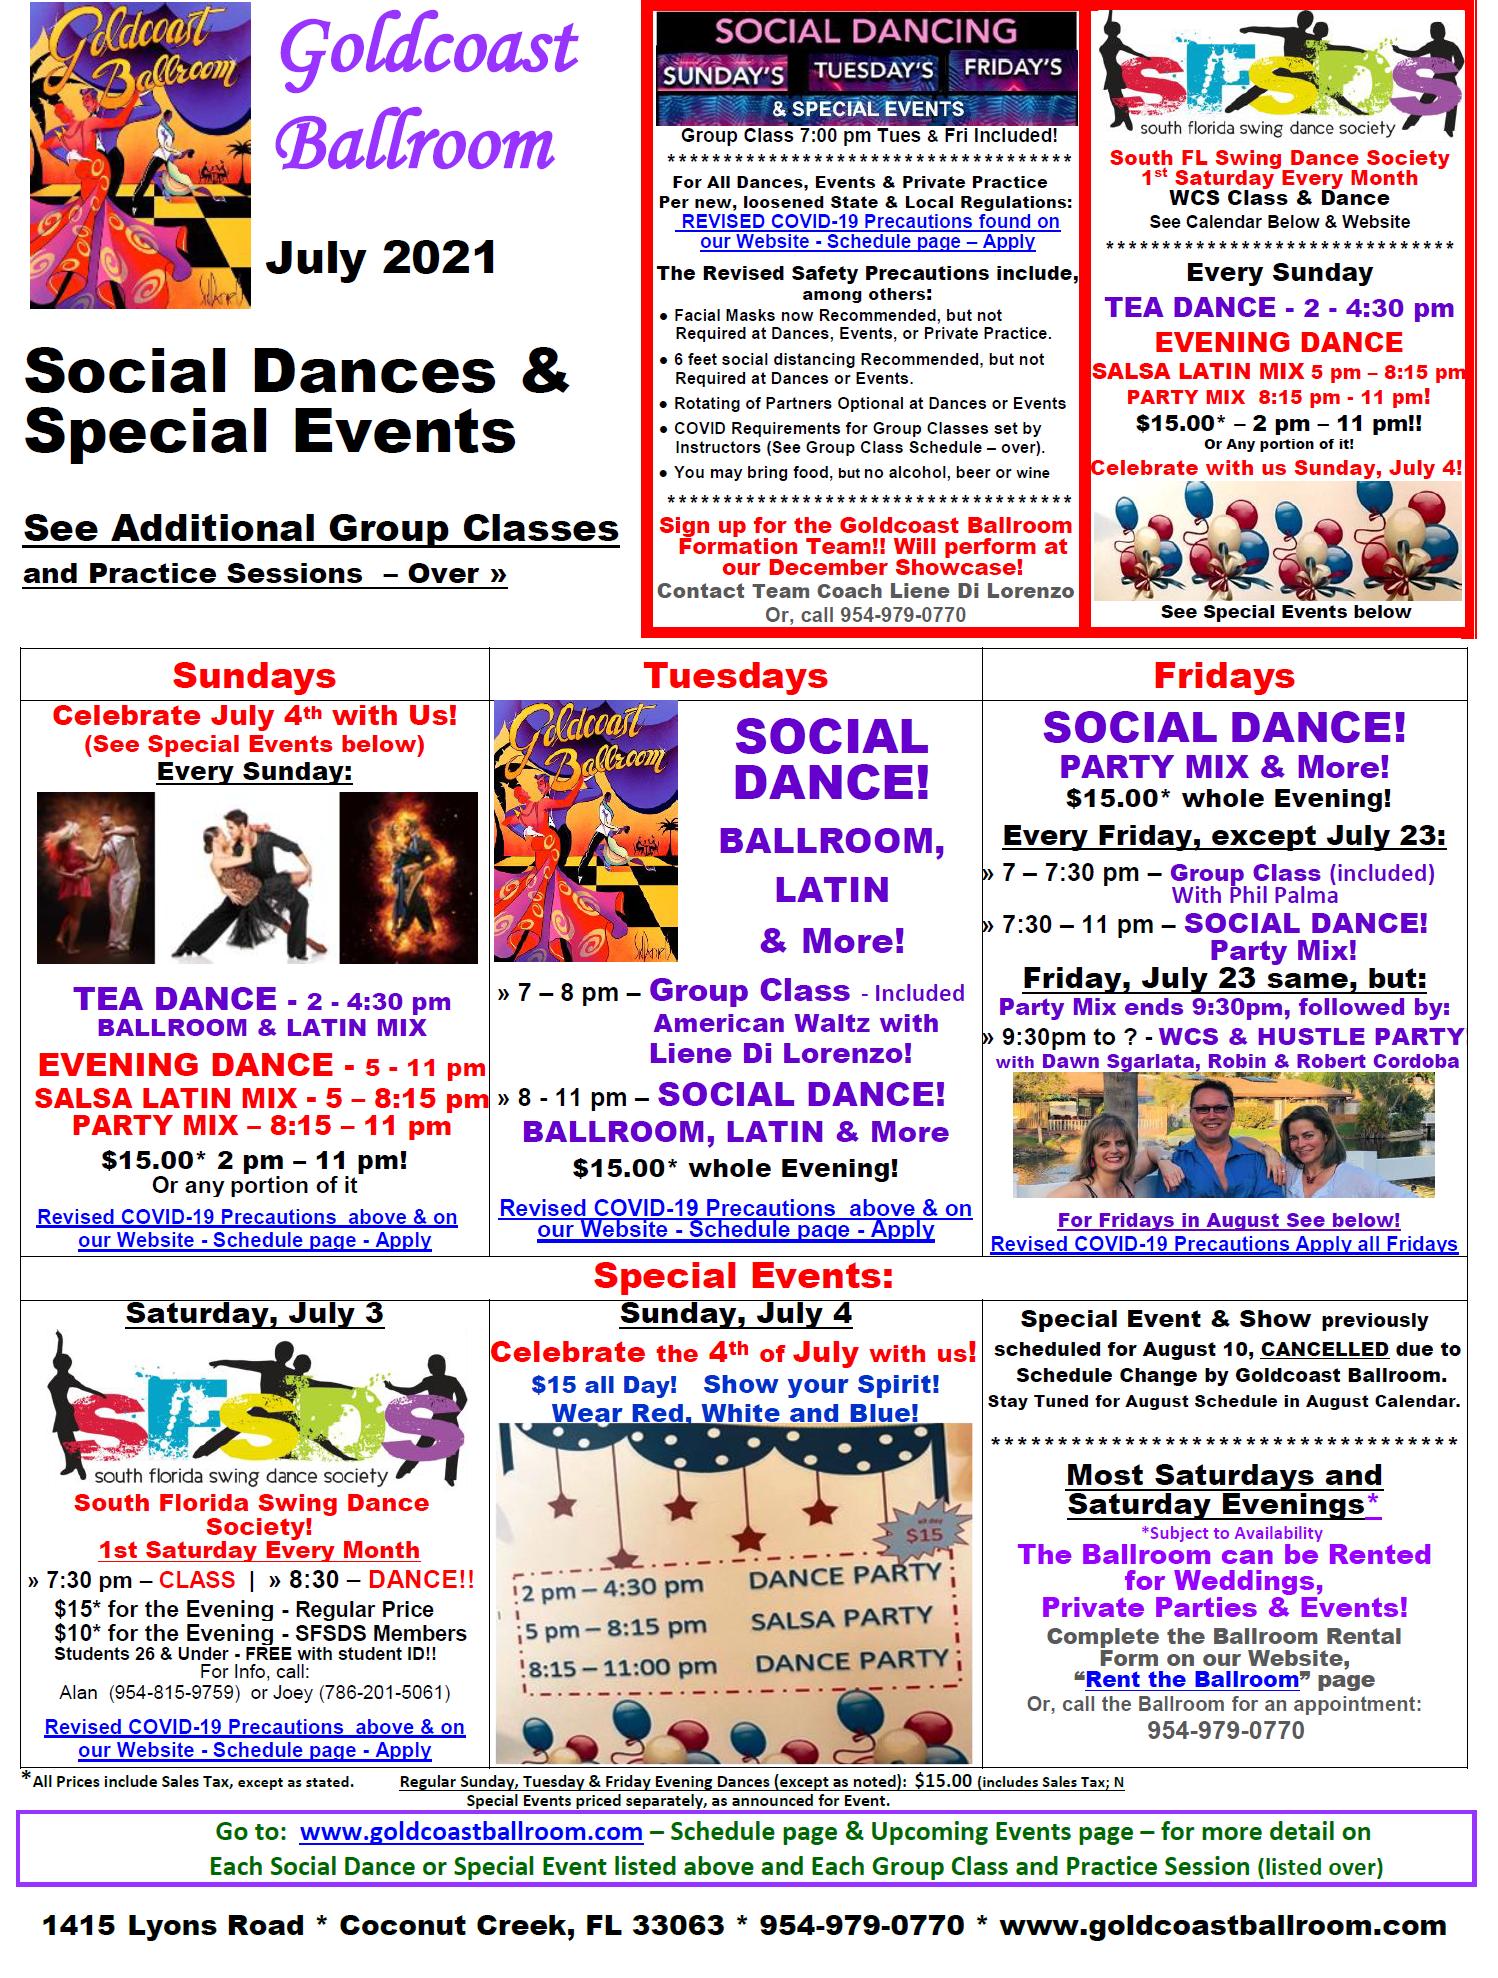 Goldcoast Ballroom July, 2021 Calendar - Social Dances & Special Events